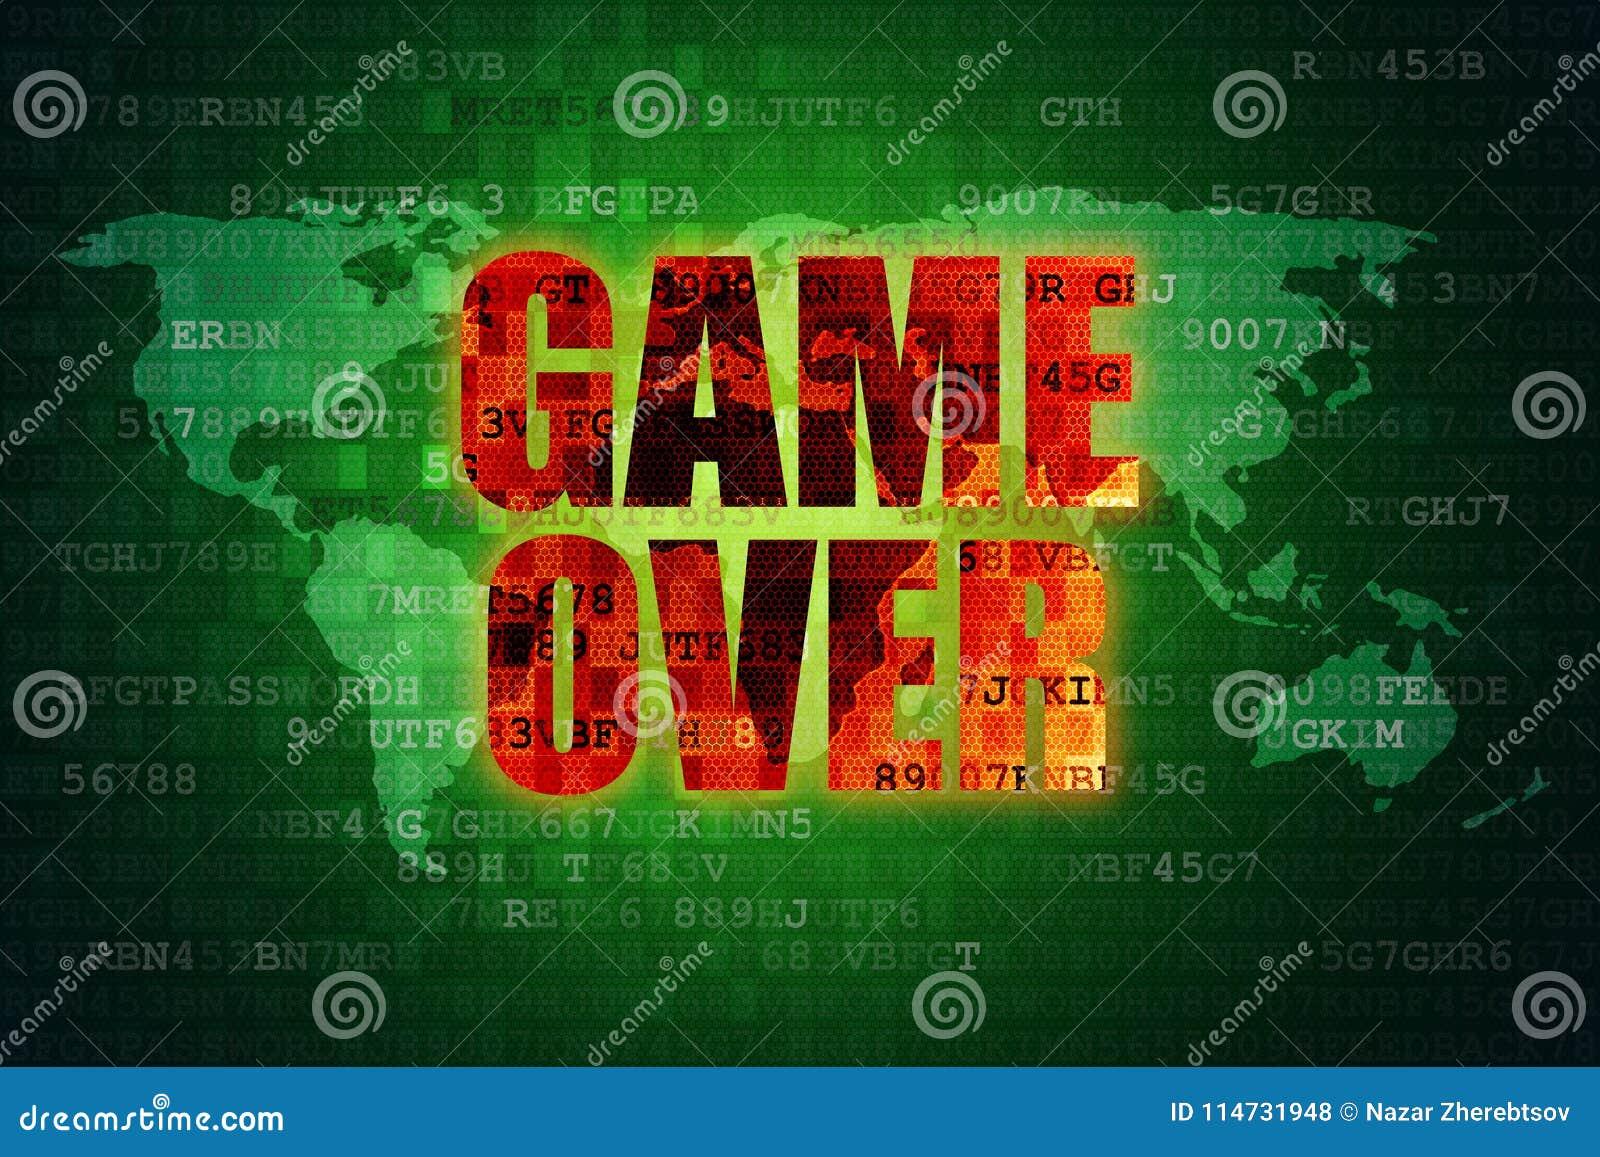 Illustration of pixel red game over screen on green digital world download illustration of pixel red game over screen on green digital world map background stock illustration gumiabroncs Gallery